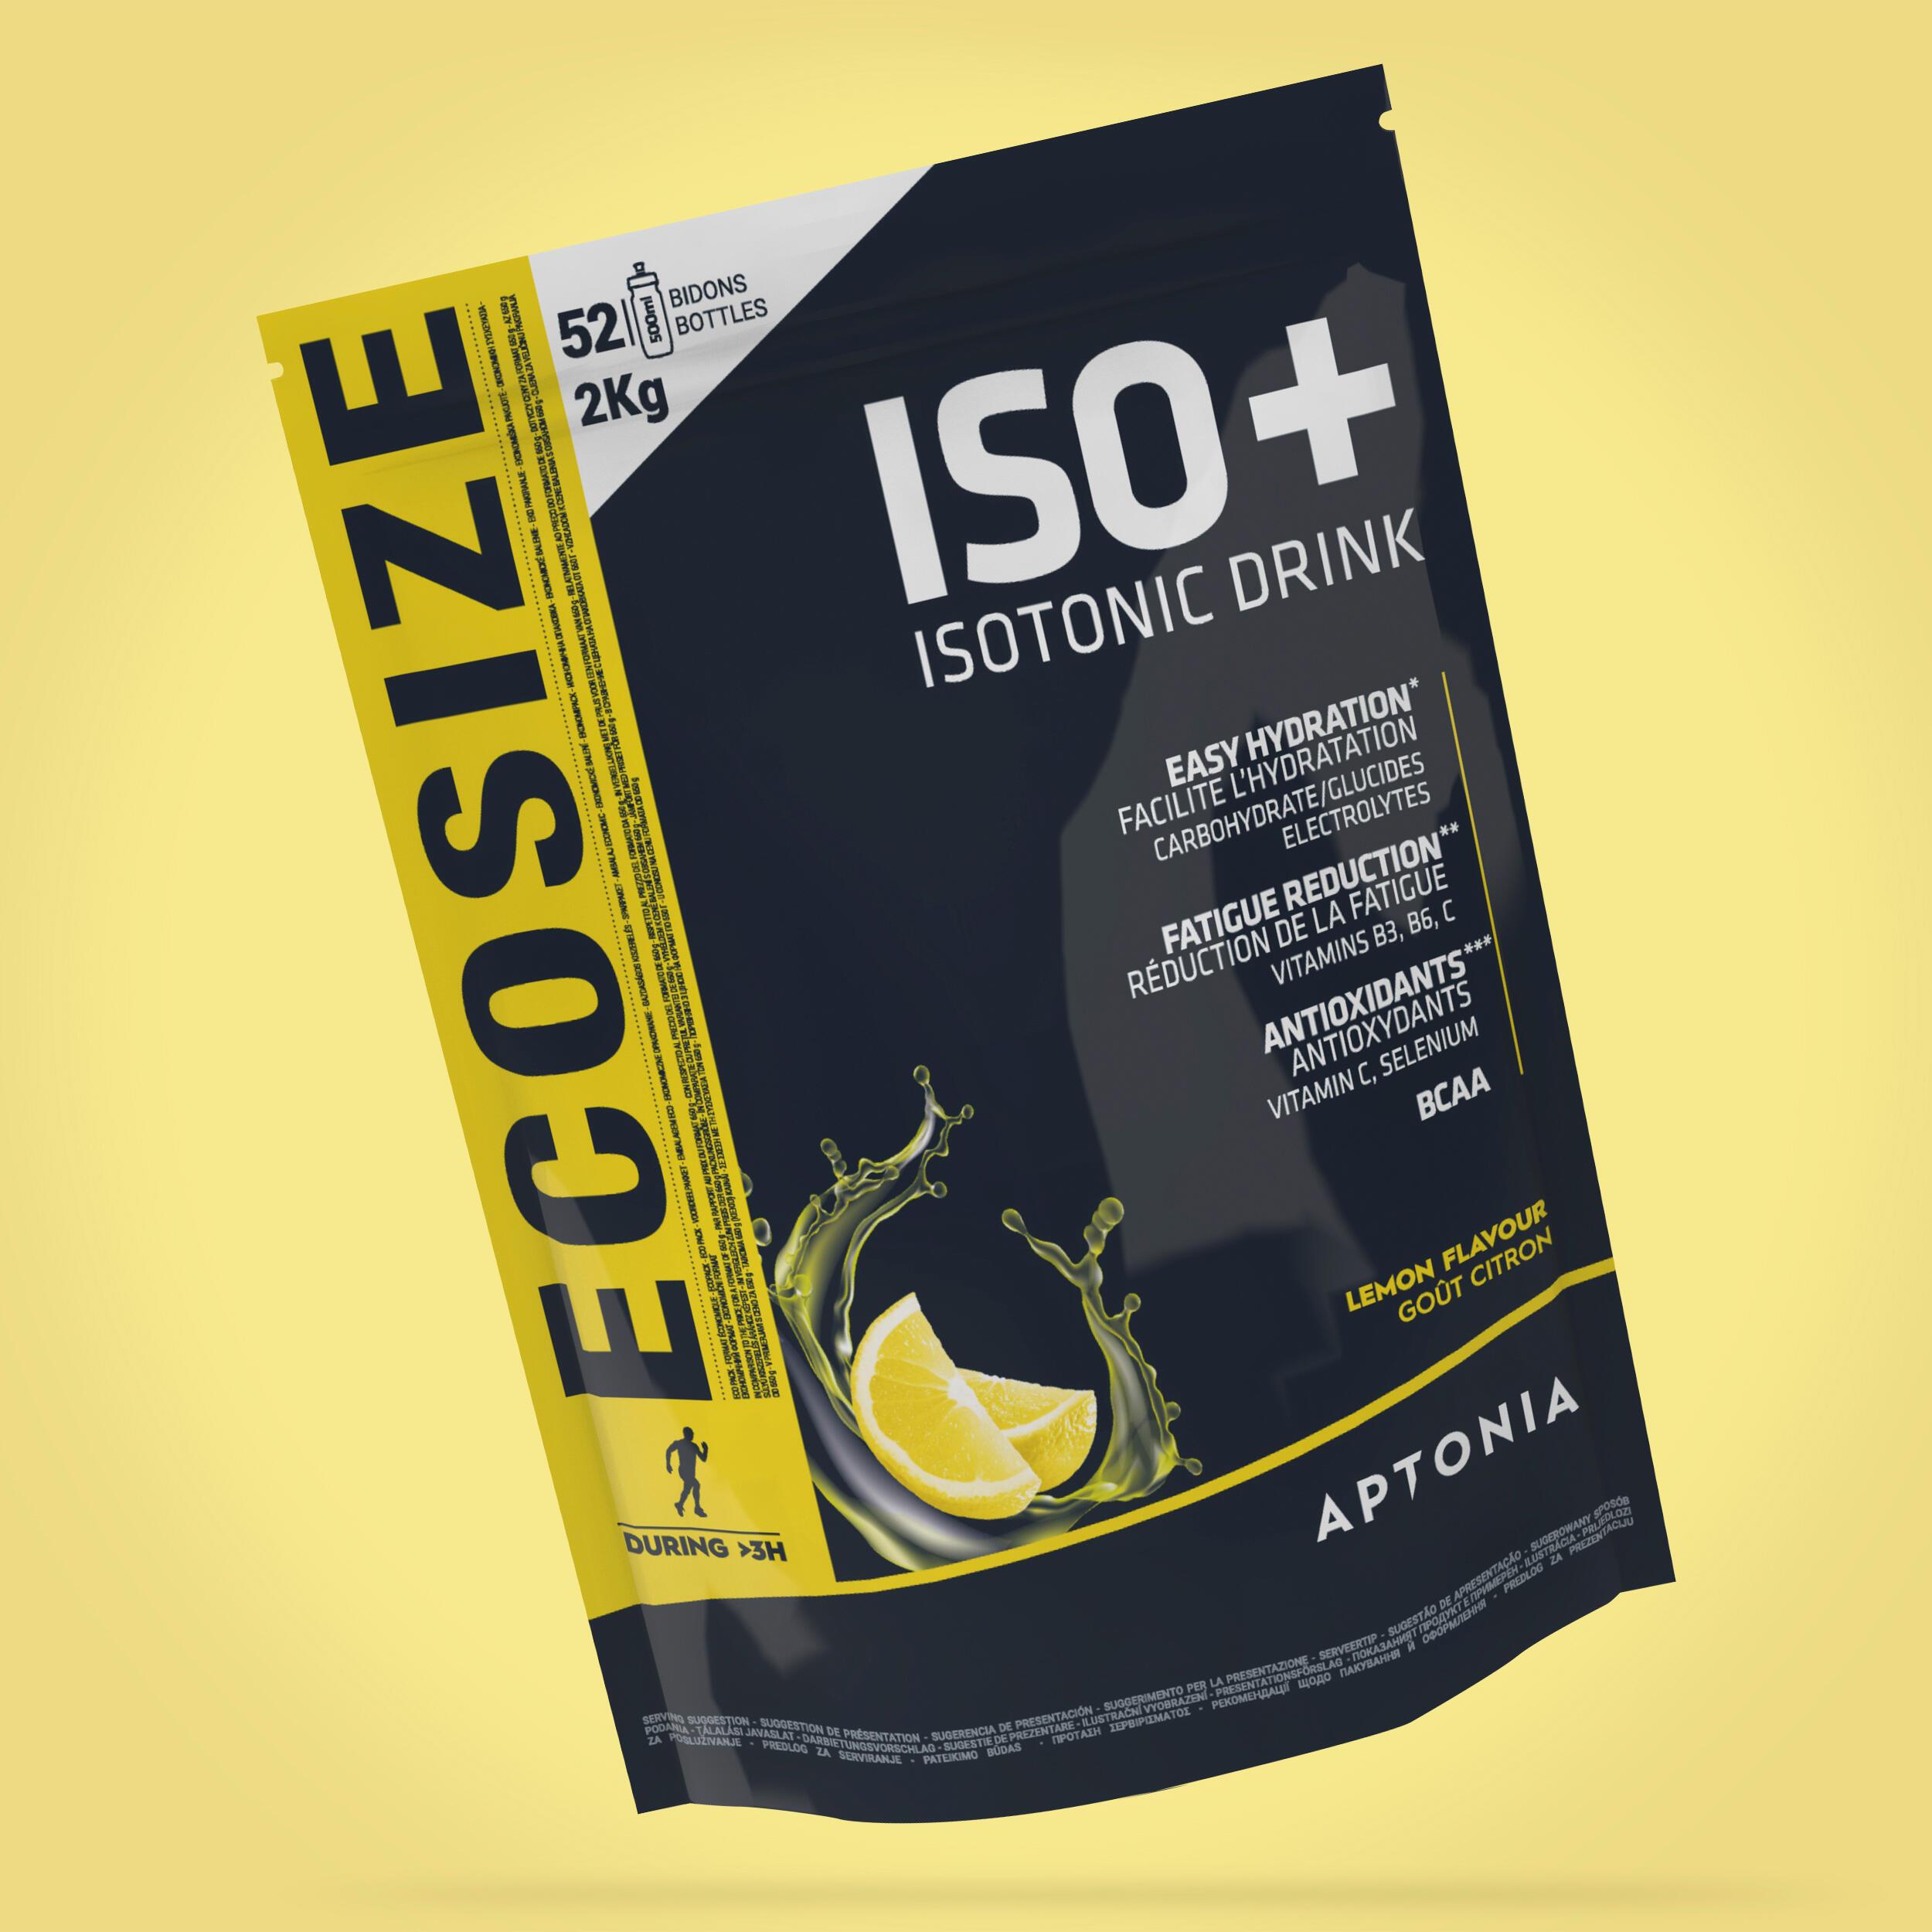 APTONIA. BEVANDA ISOTONICA IN POLVERE ISO+ LIMONE 2 kg